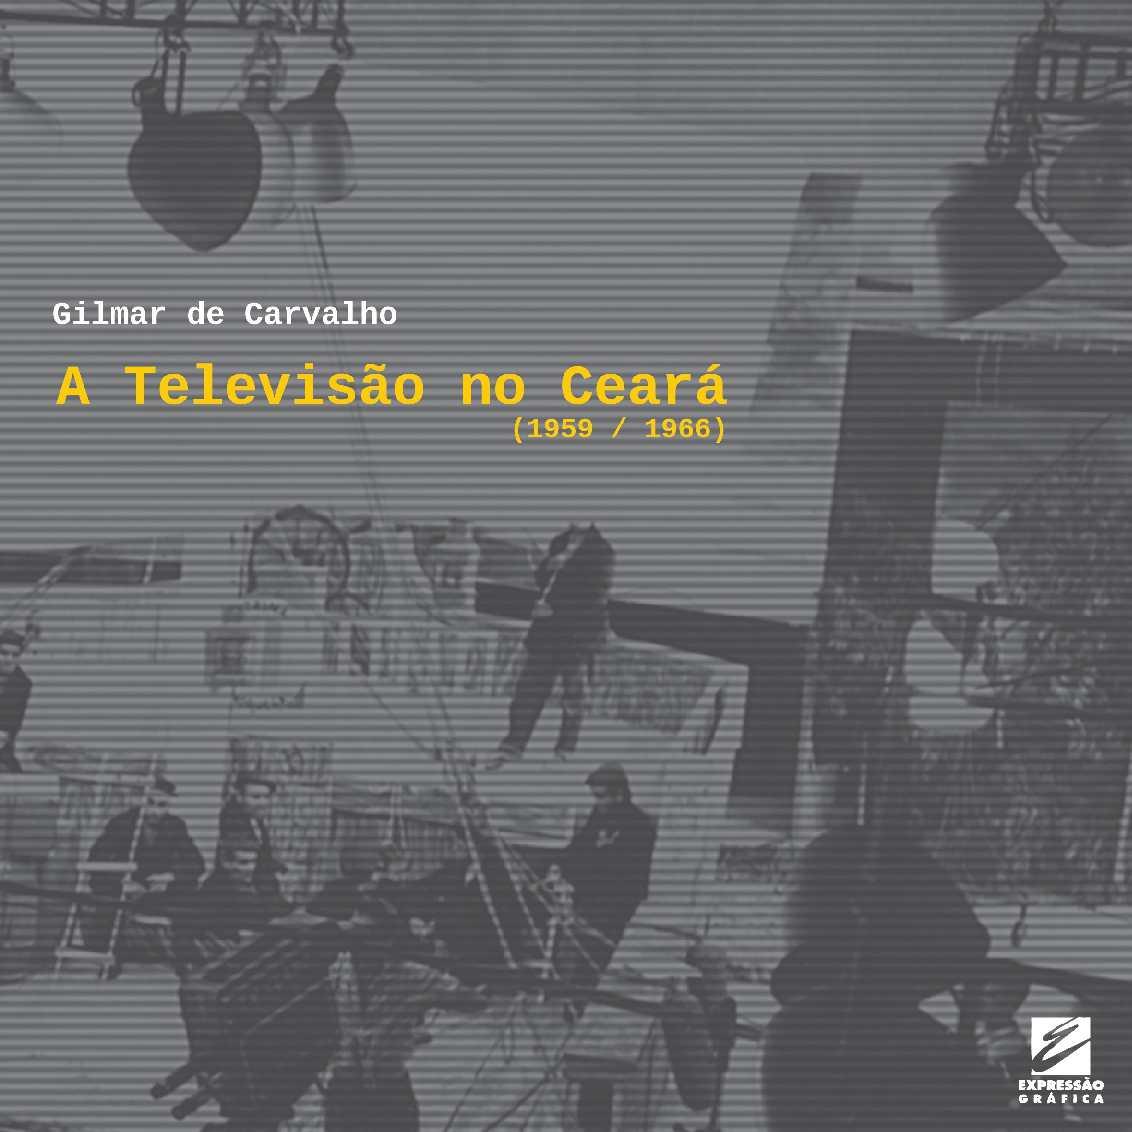 A Televisão no Ceará